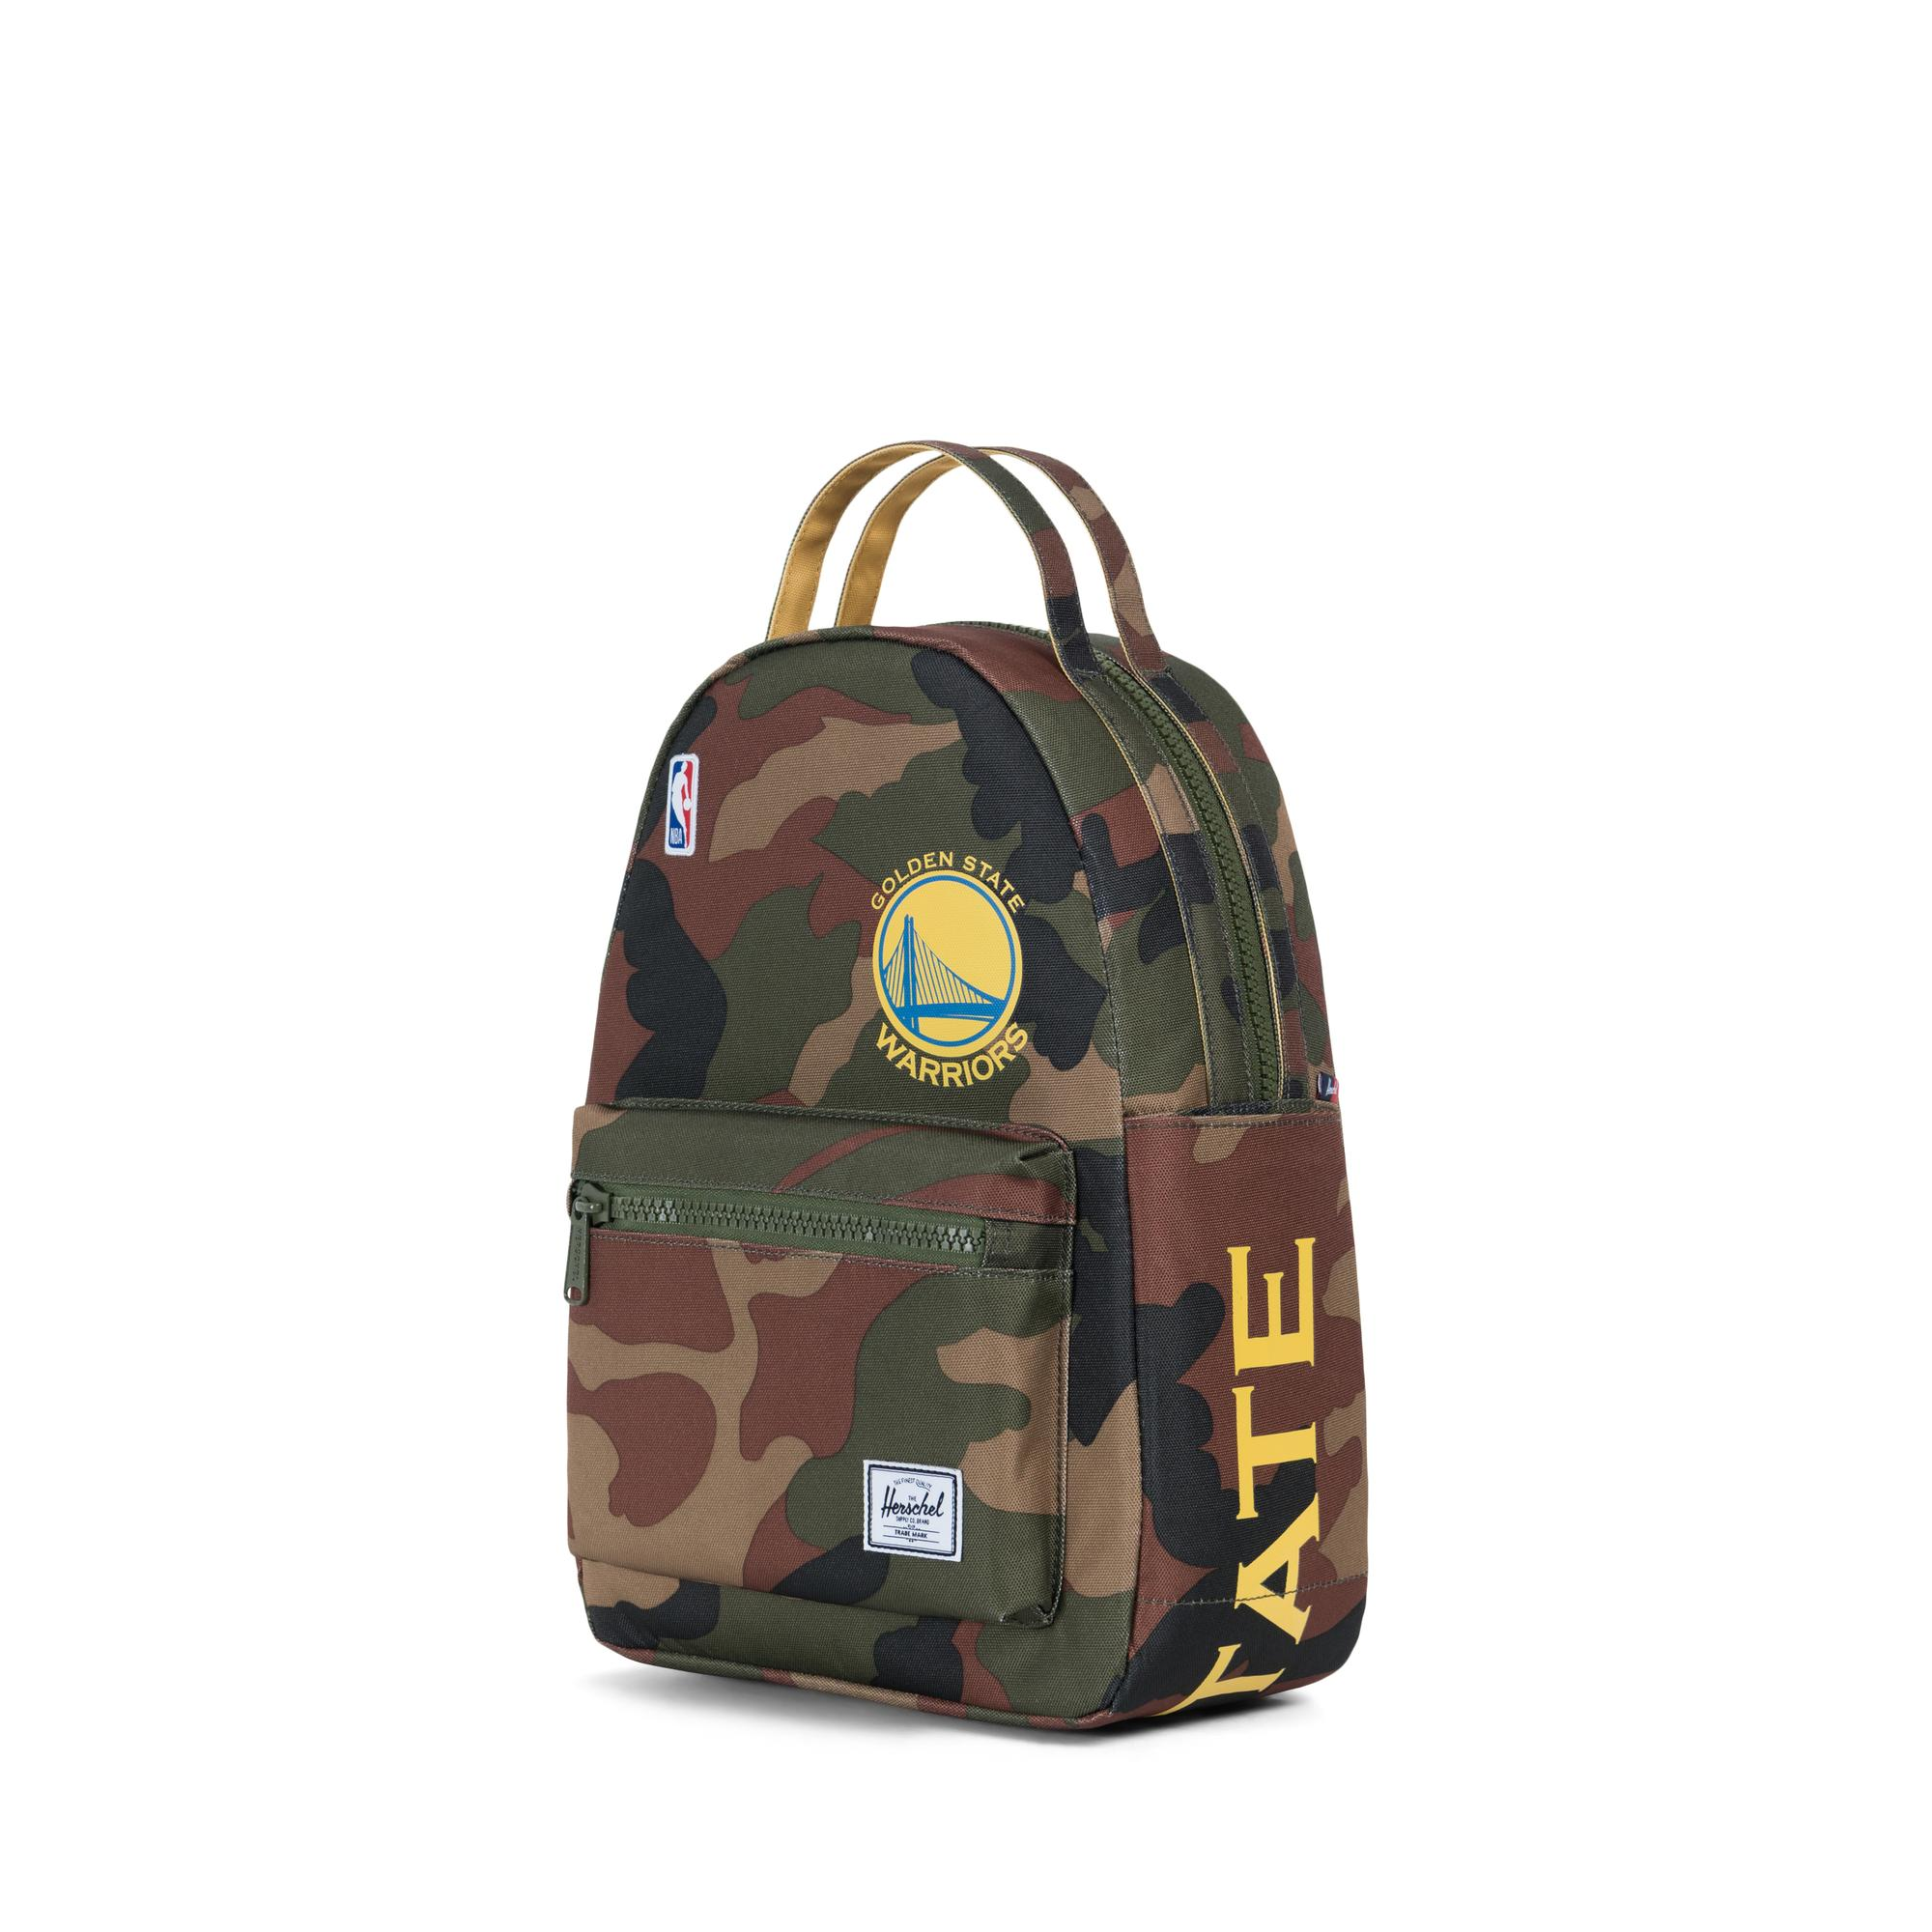 06bff46a984 Nova Backpack Small NBA Superfan